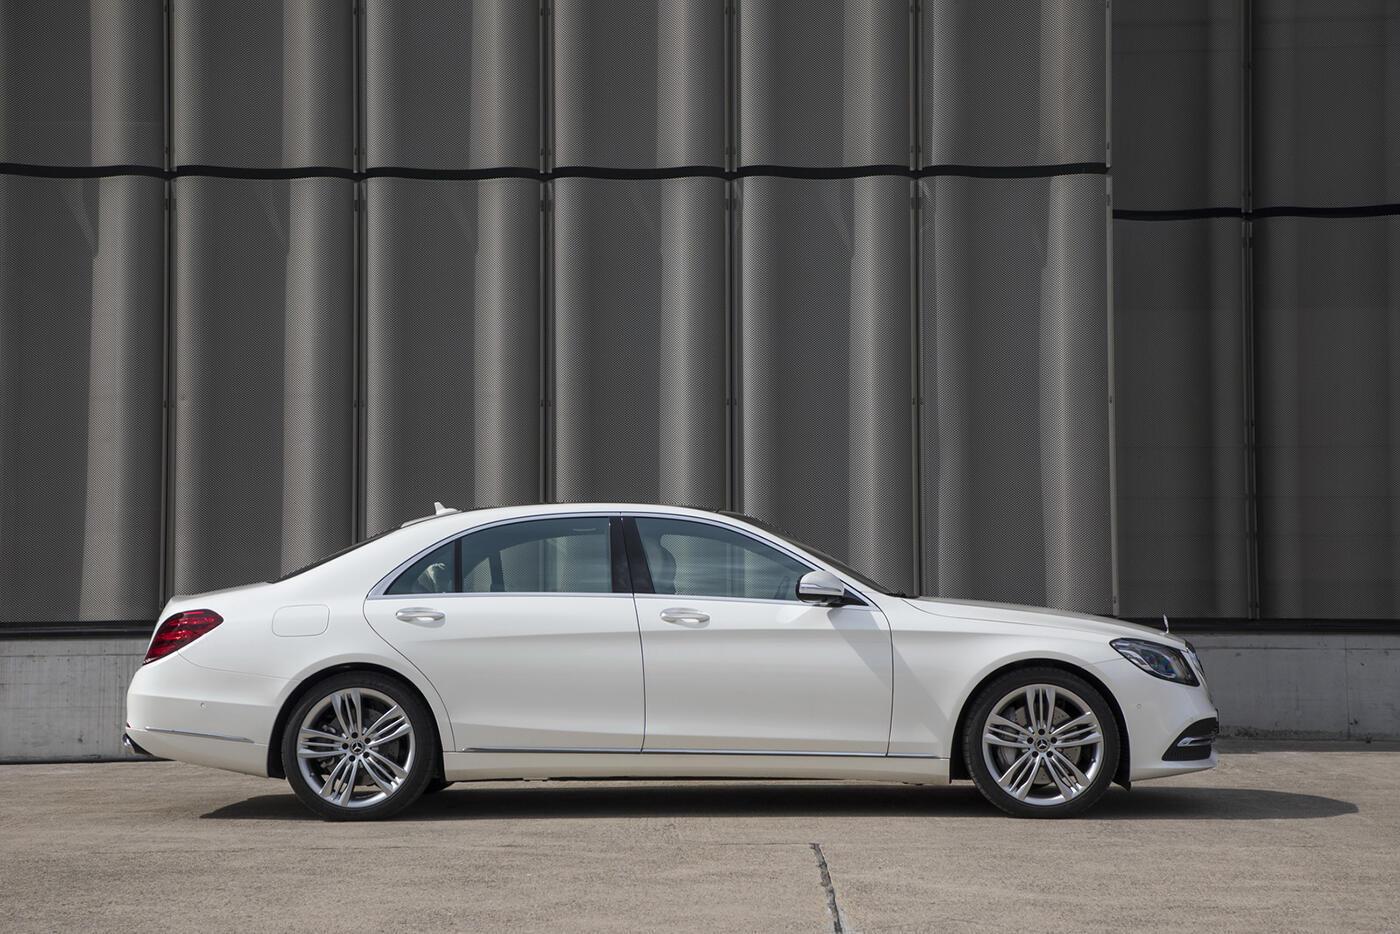 Ảnh chi tiết Mercedes-Benz S-Class 2018 - Hình 35